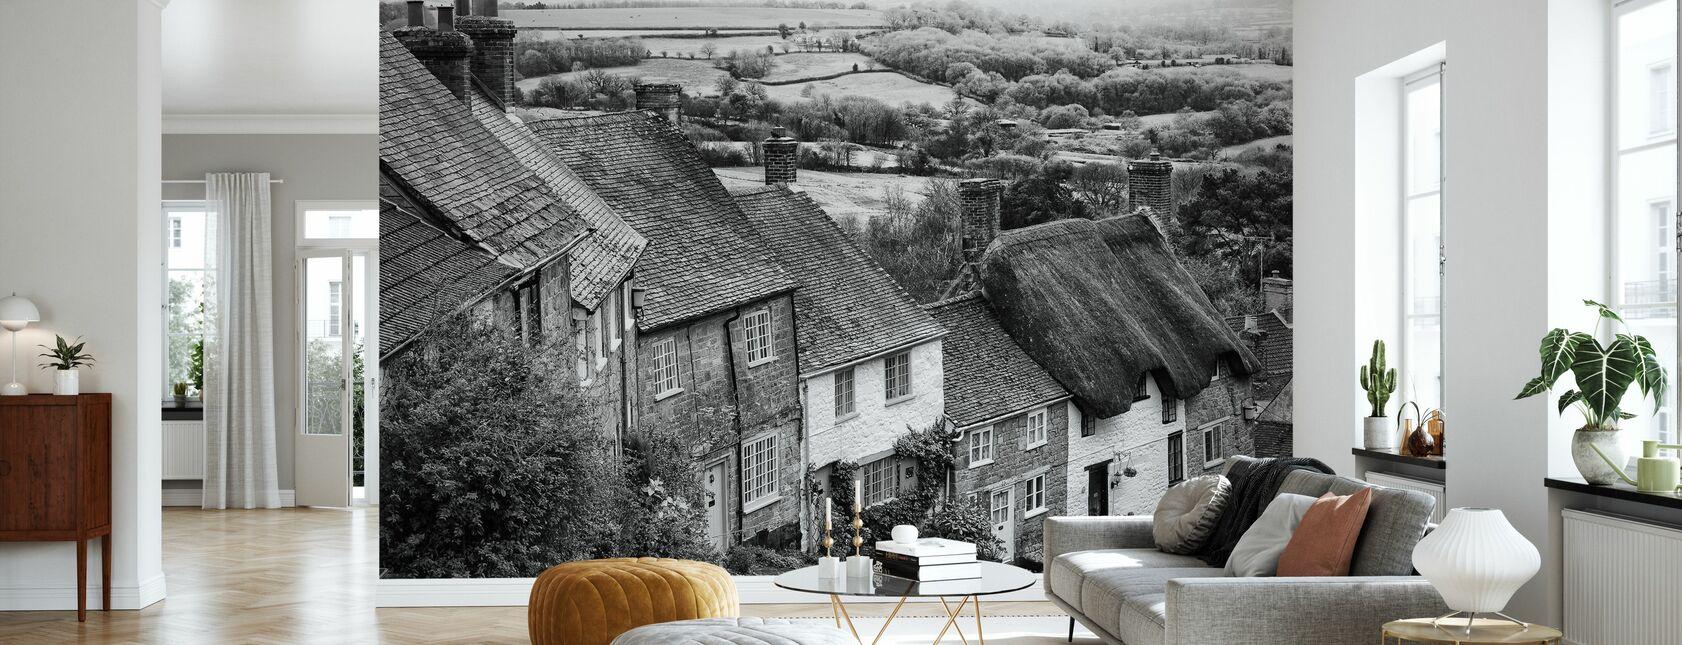 Gold Hill Shaftsbury Somerset - Wallpaper - Living Room